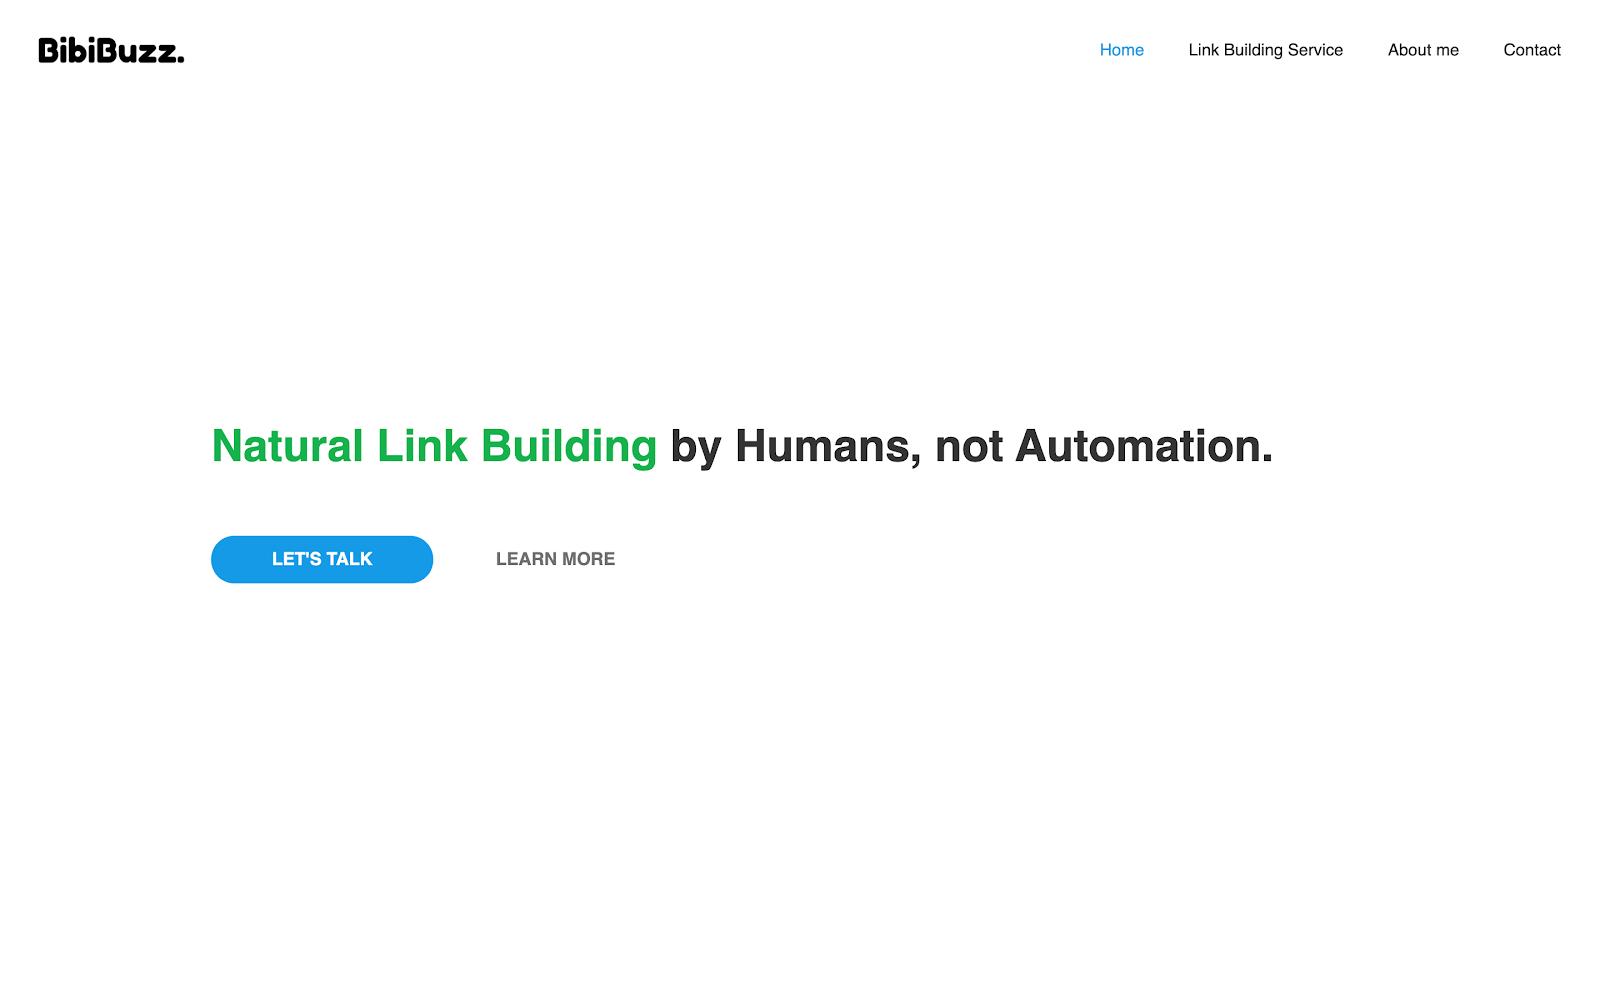 BibiBuzz home page